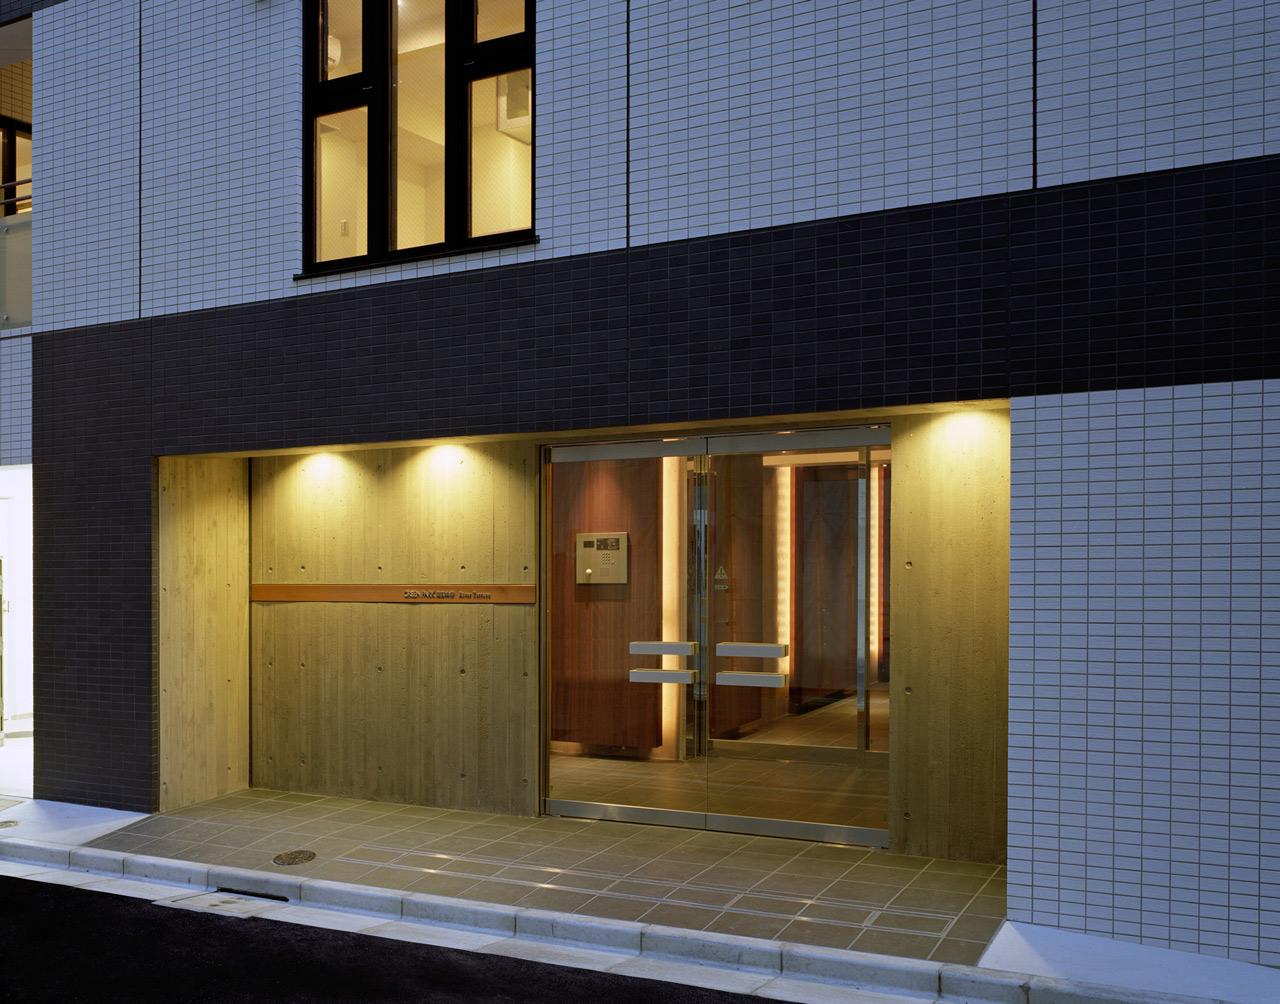 GREEN PARK 東日本橋 RiverTerrace | マンションギャラリー